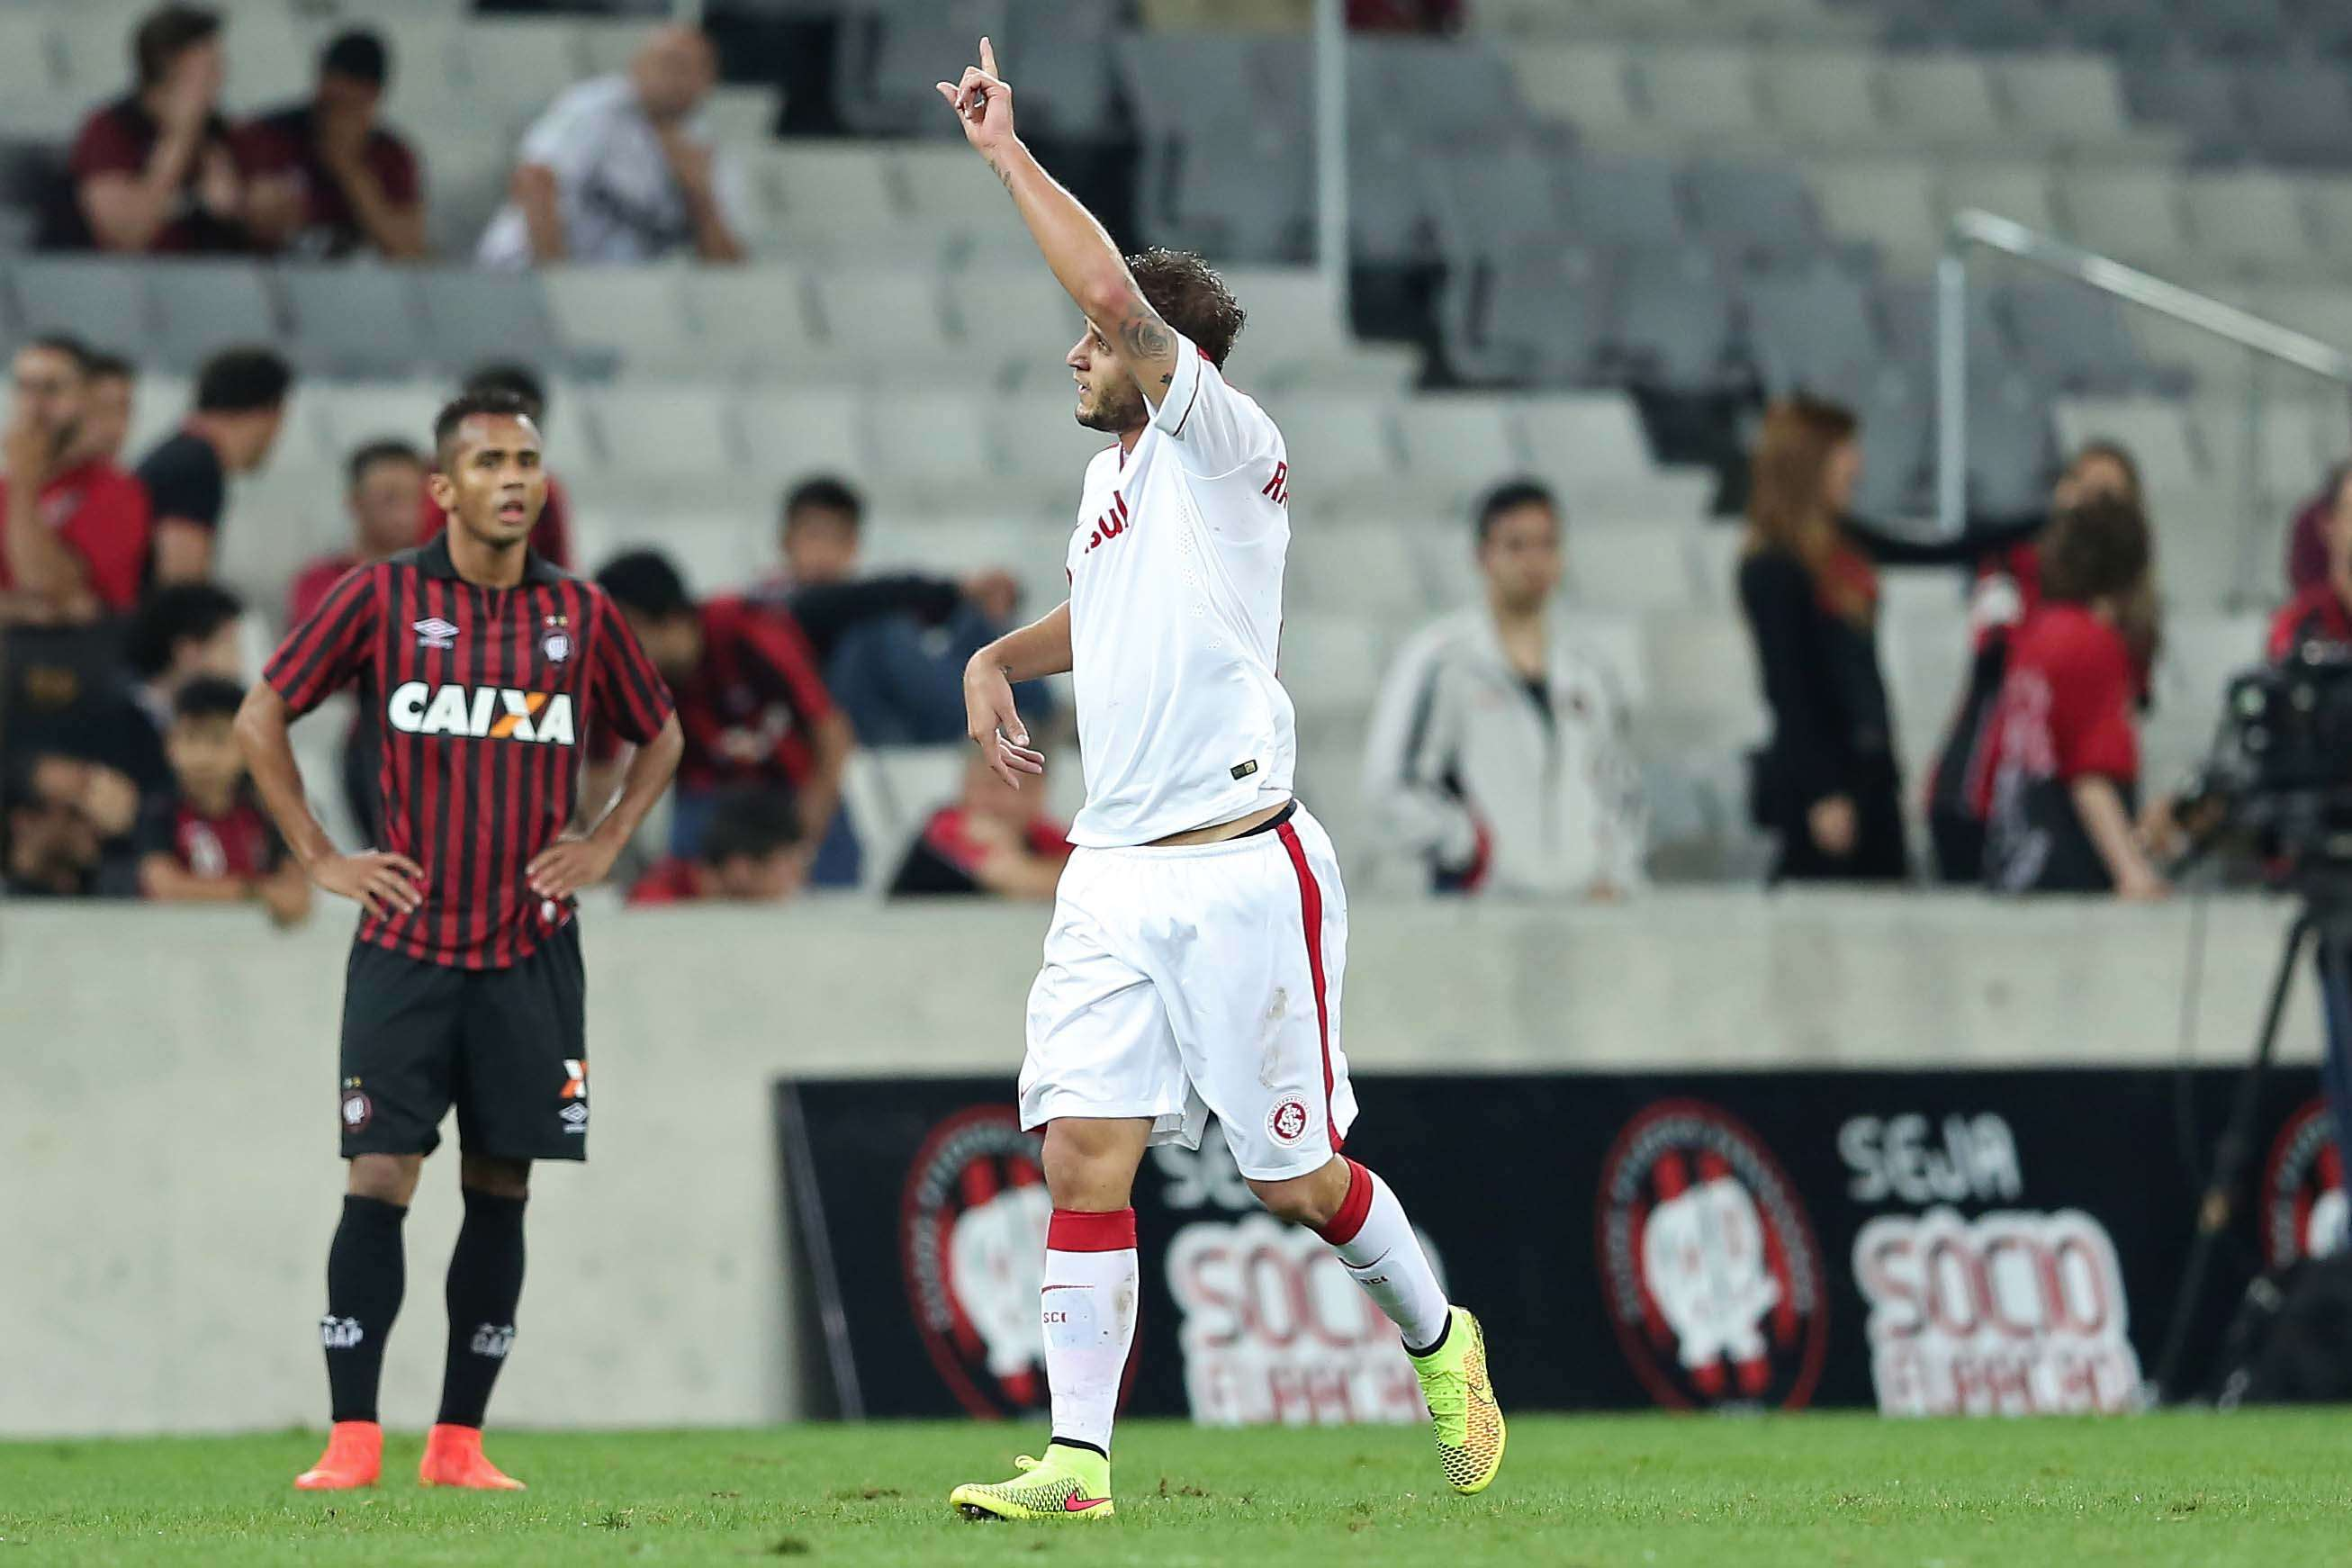 Rafael Moura comemora gol marcado na Arena da Baixada Foto: Heuler Andrey/Getty Images